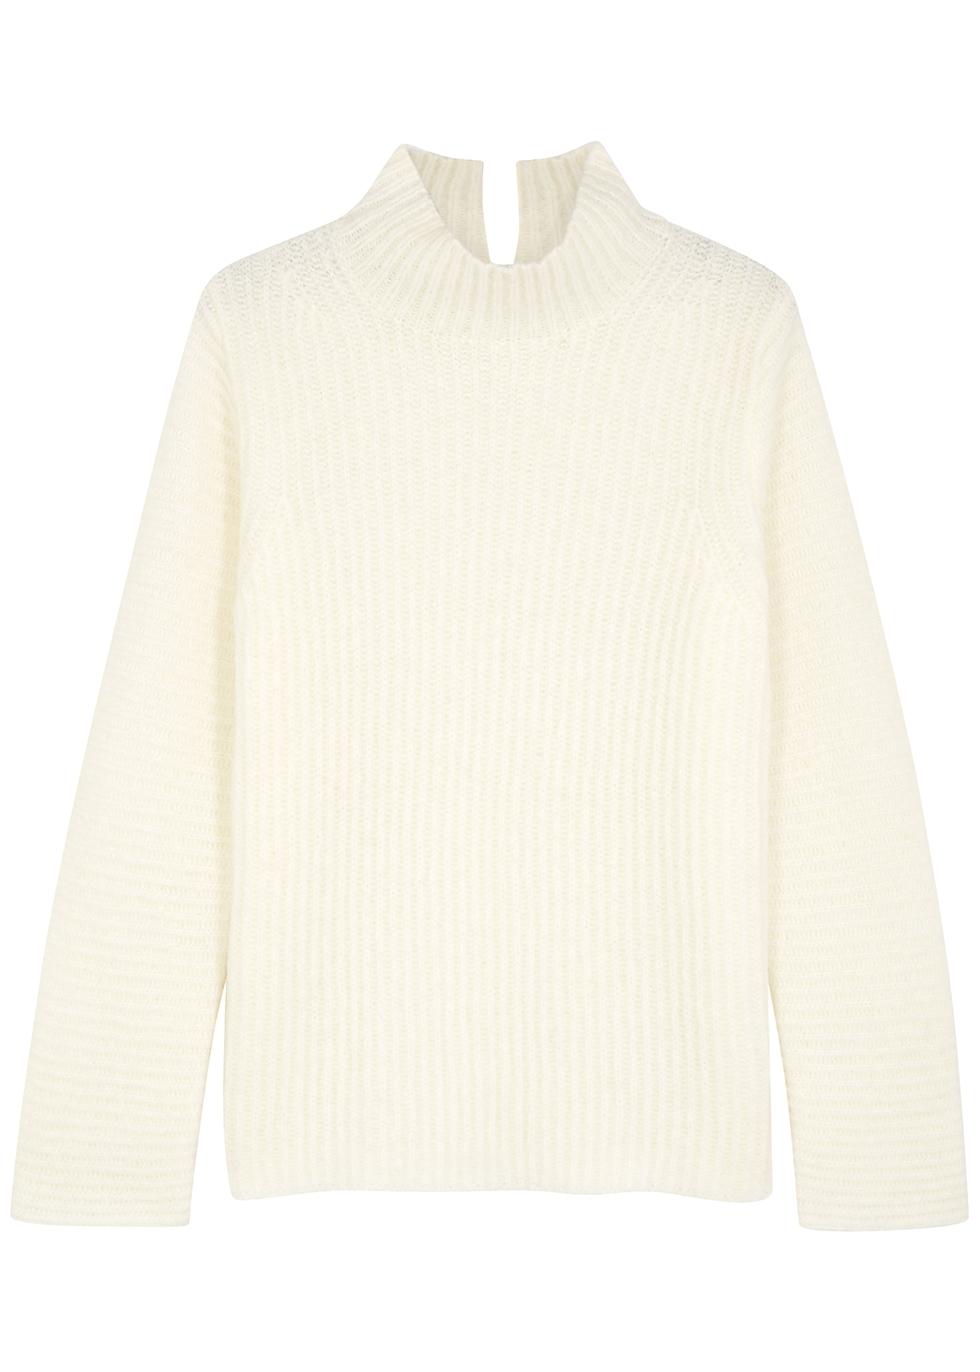 Ghost ivory wool-blend jumper